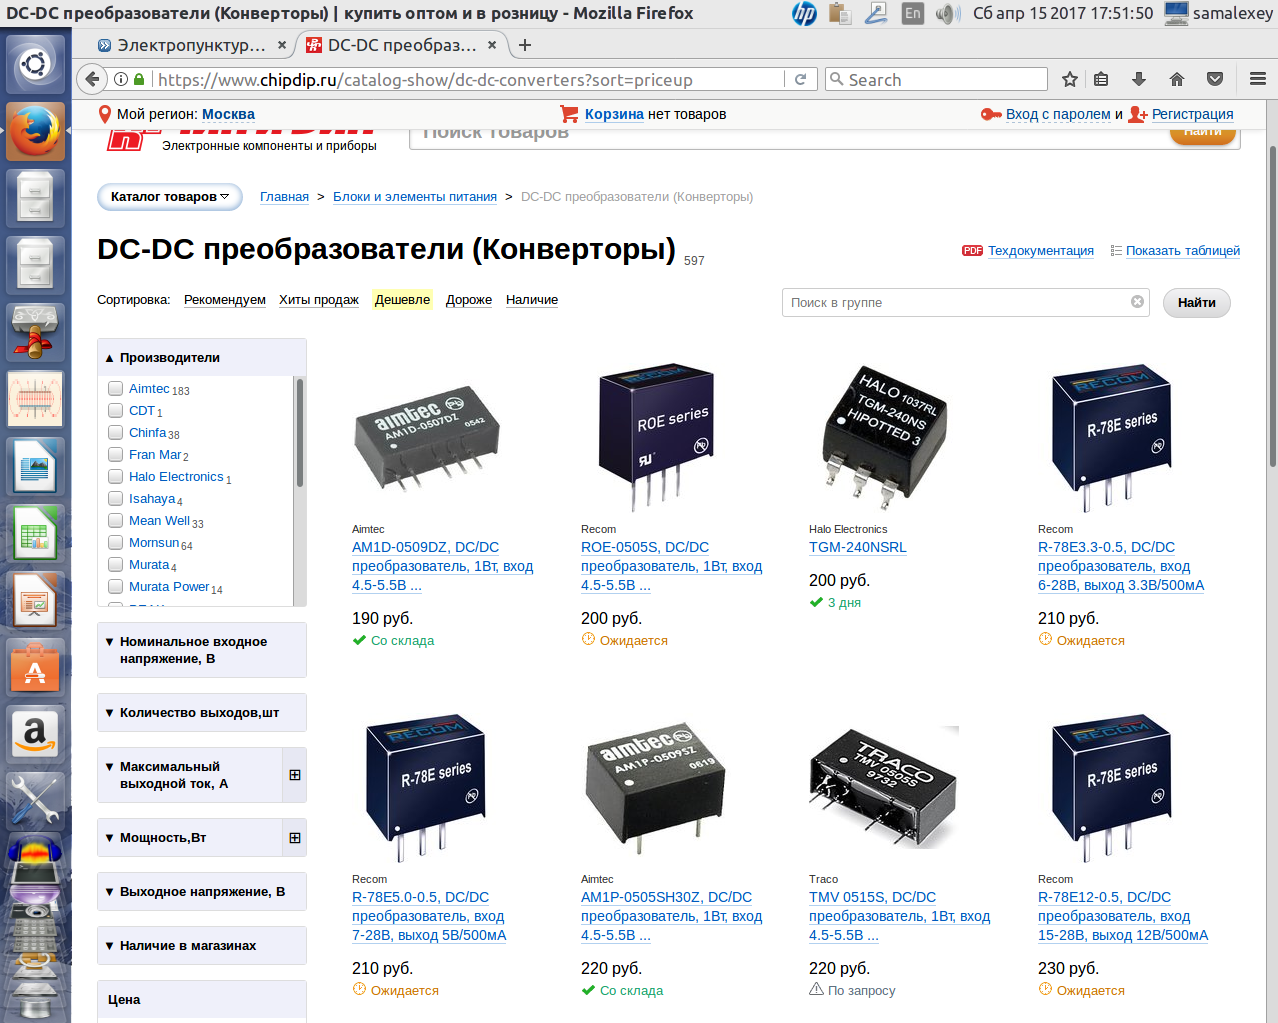 http://i3.imageban.ru/out/2017/04/15/ce18e5f22551b4efd66596c4b48b8fe3.png